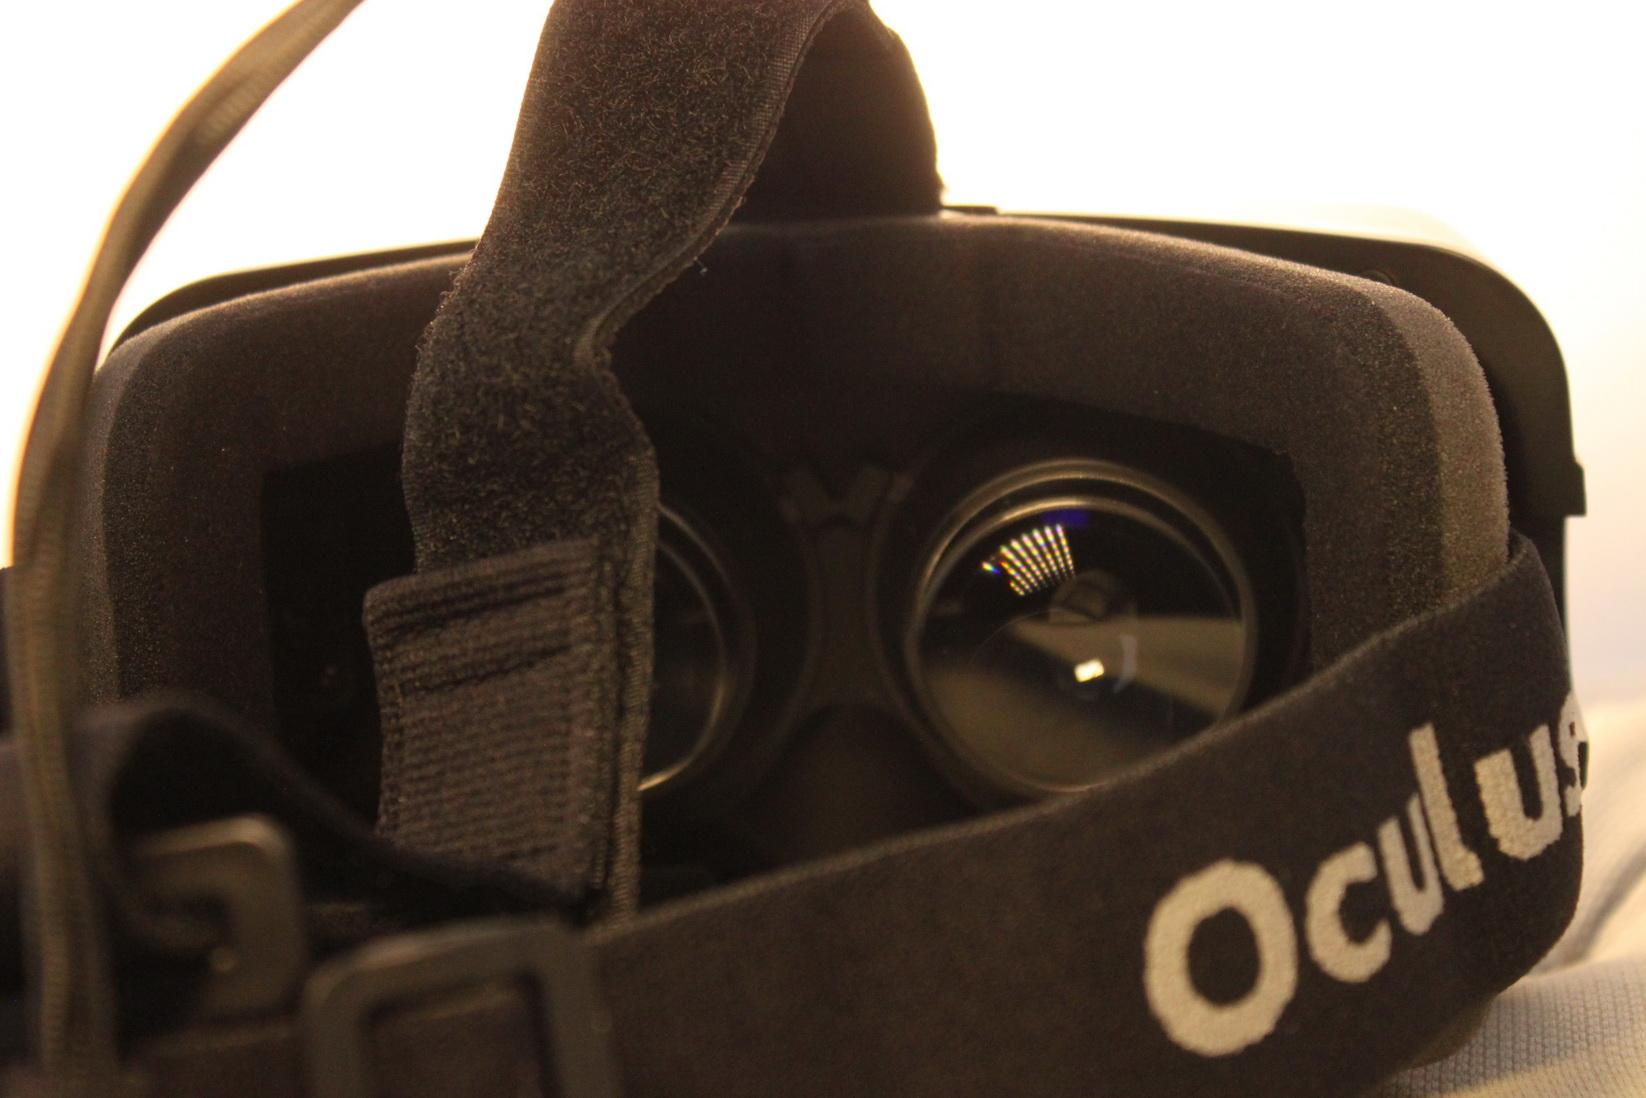 OculusRiftDK2 Gameblog 237